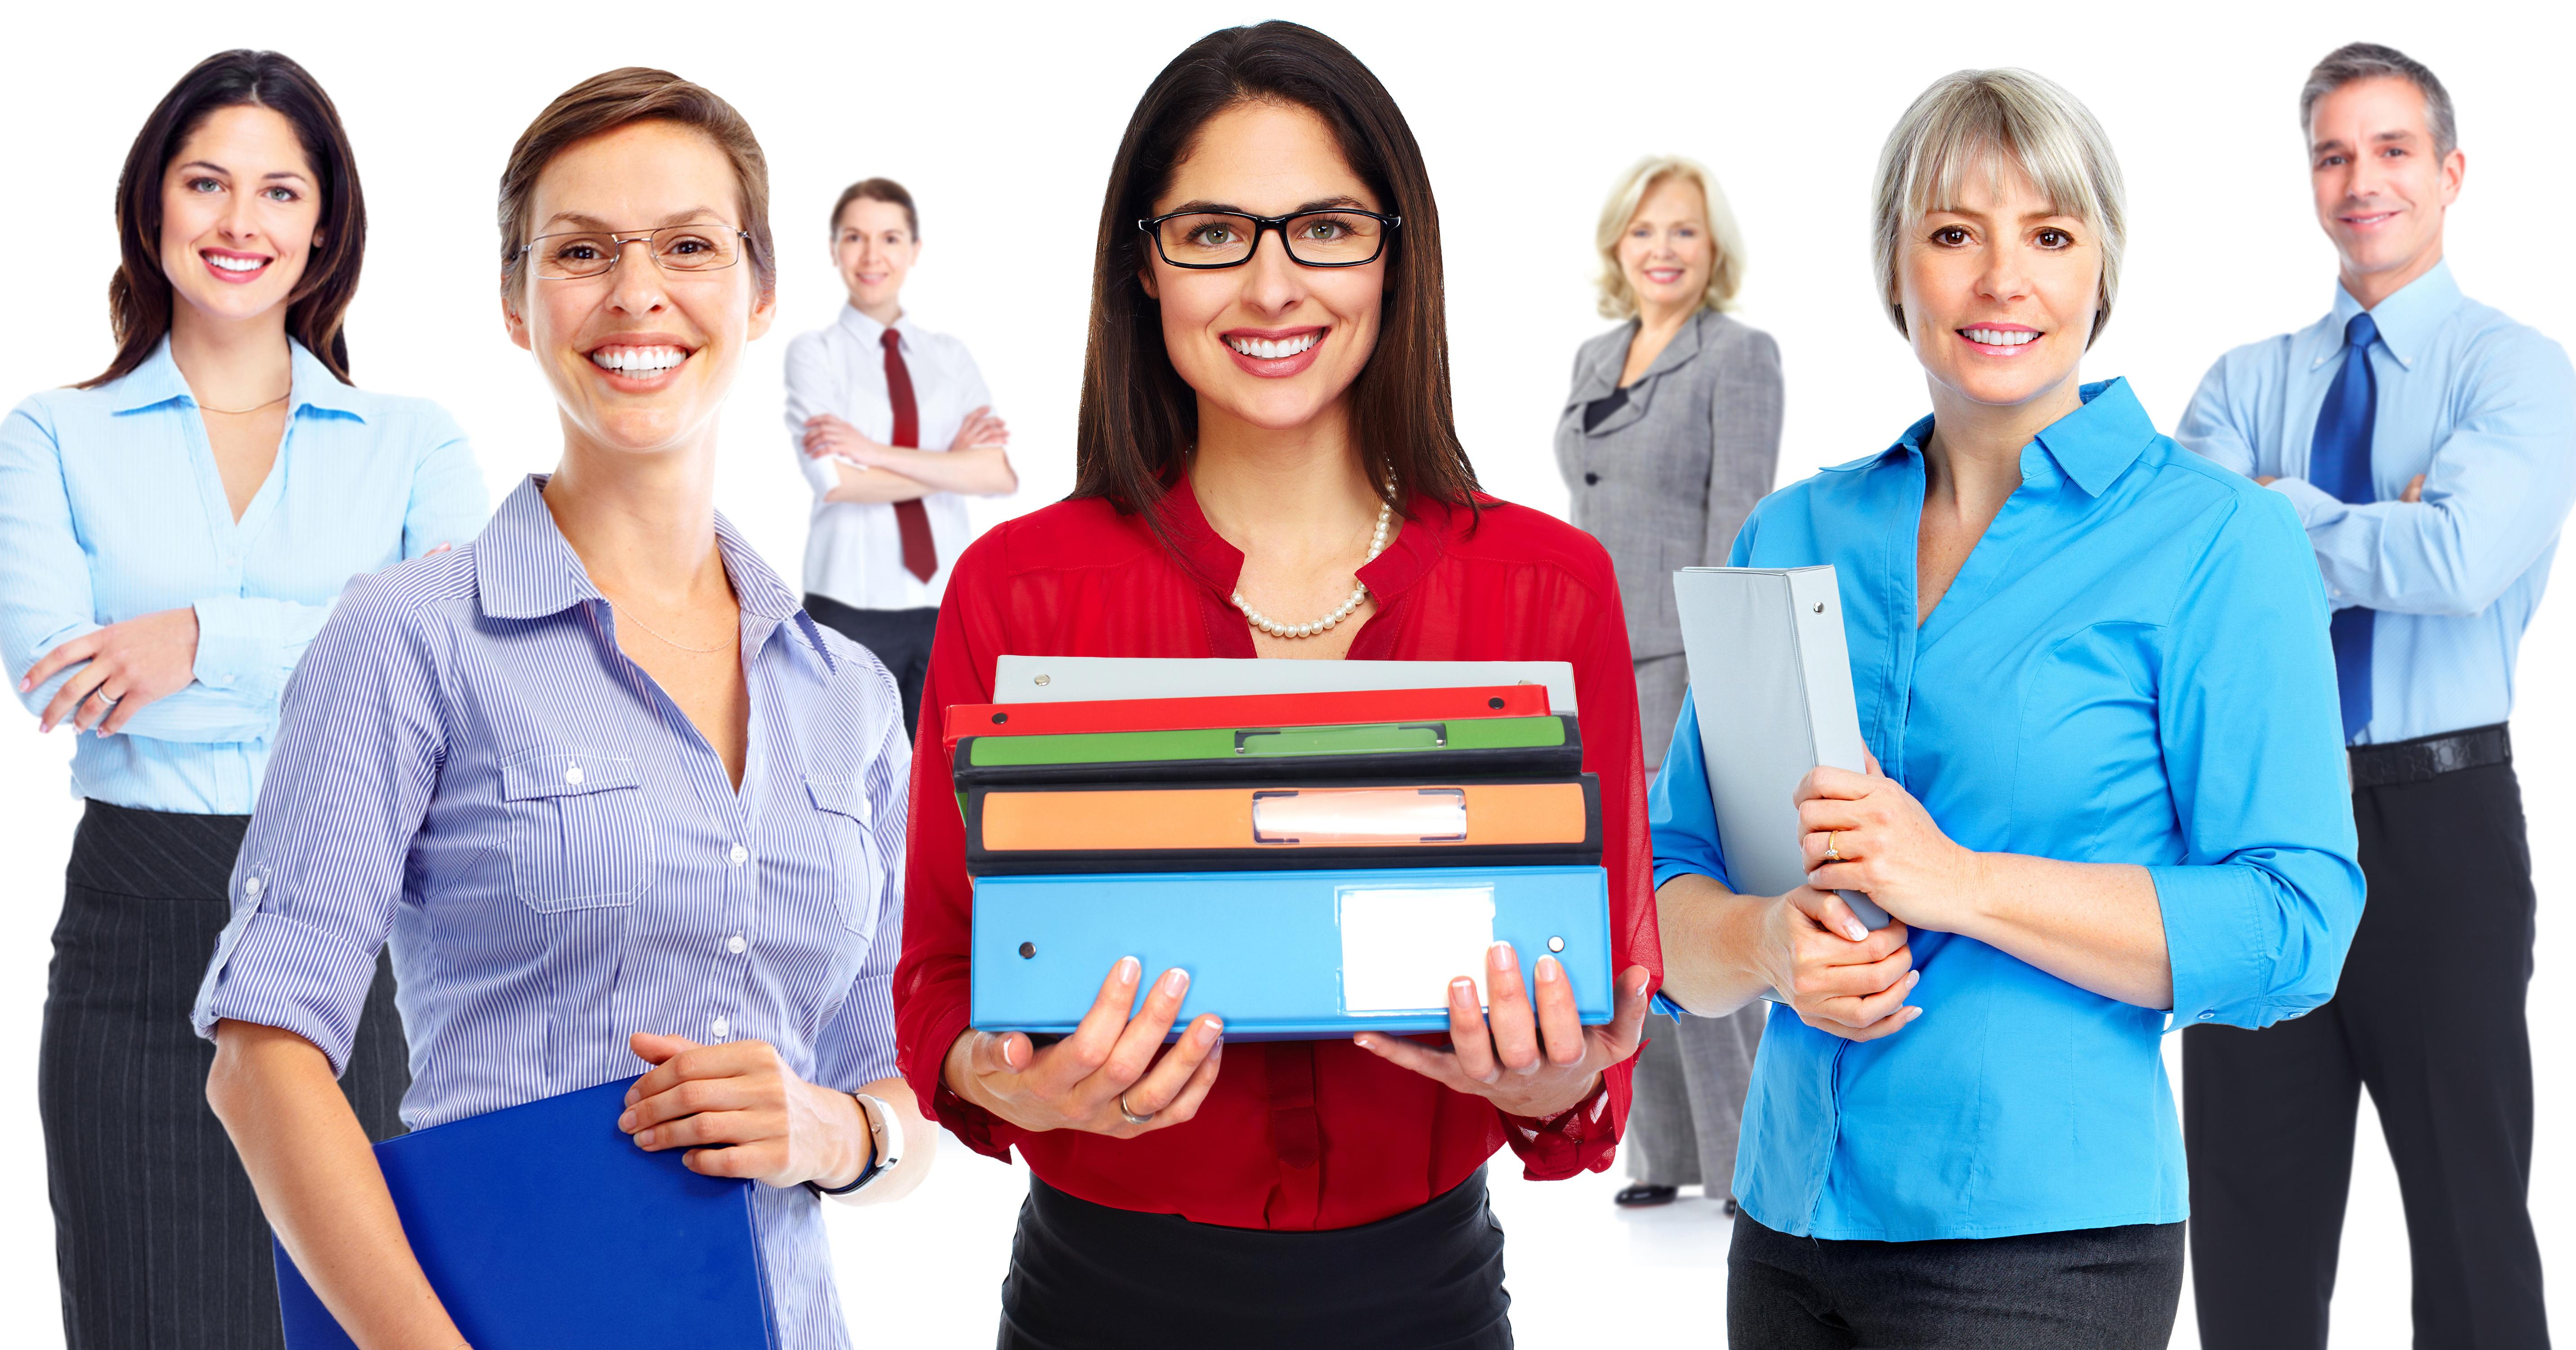 teacher superintendent salary jobs career requirements